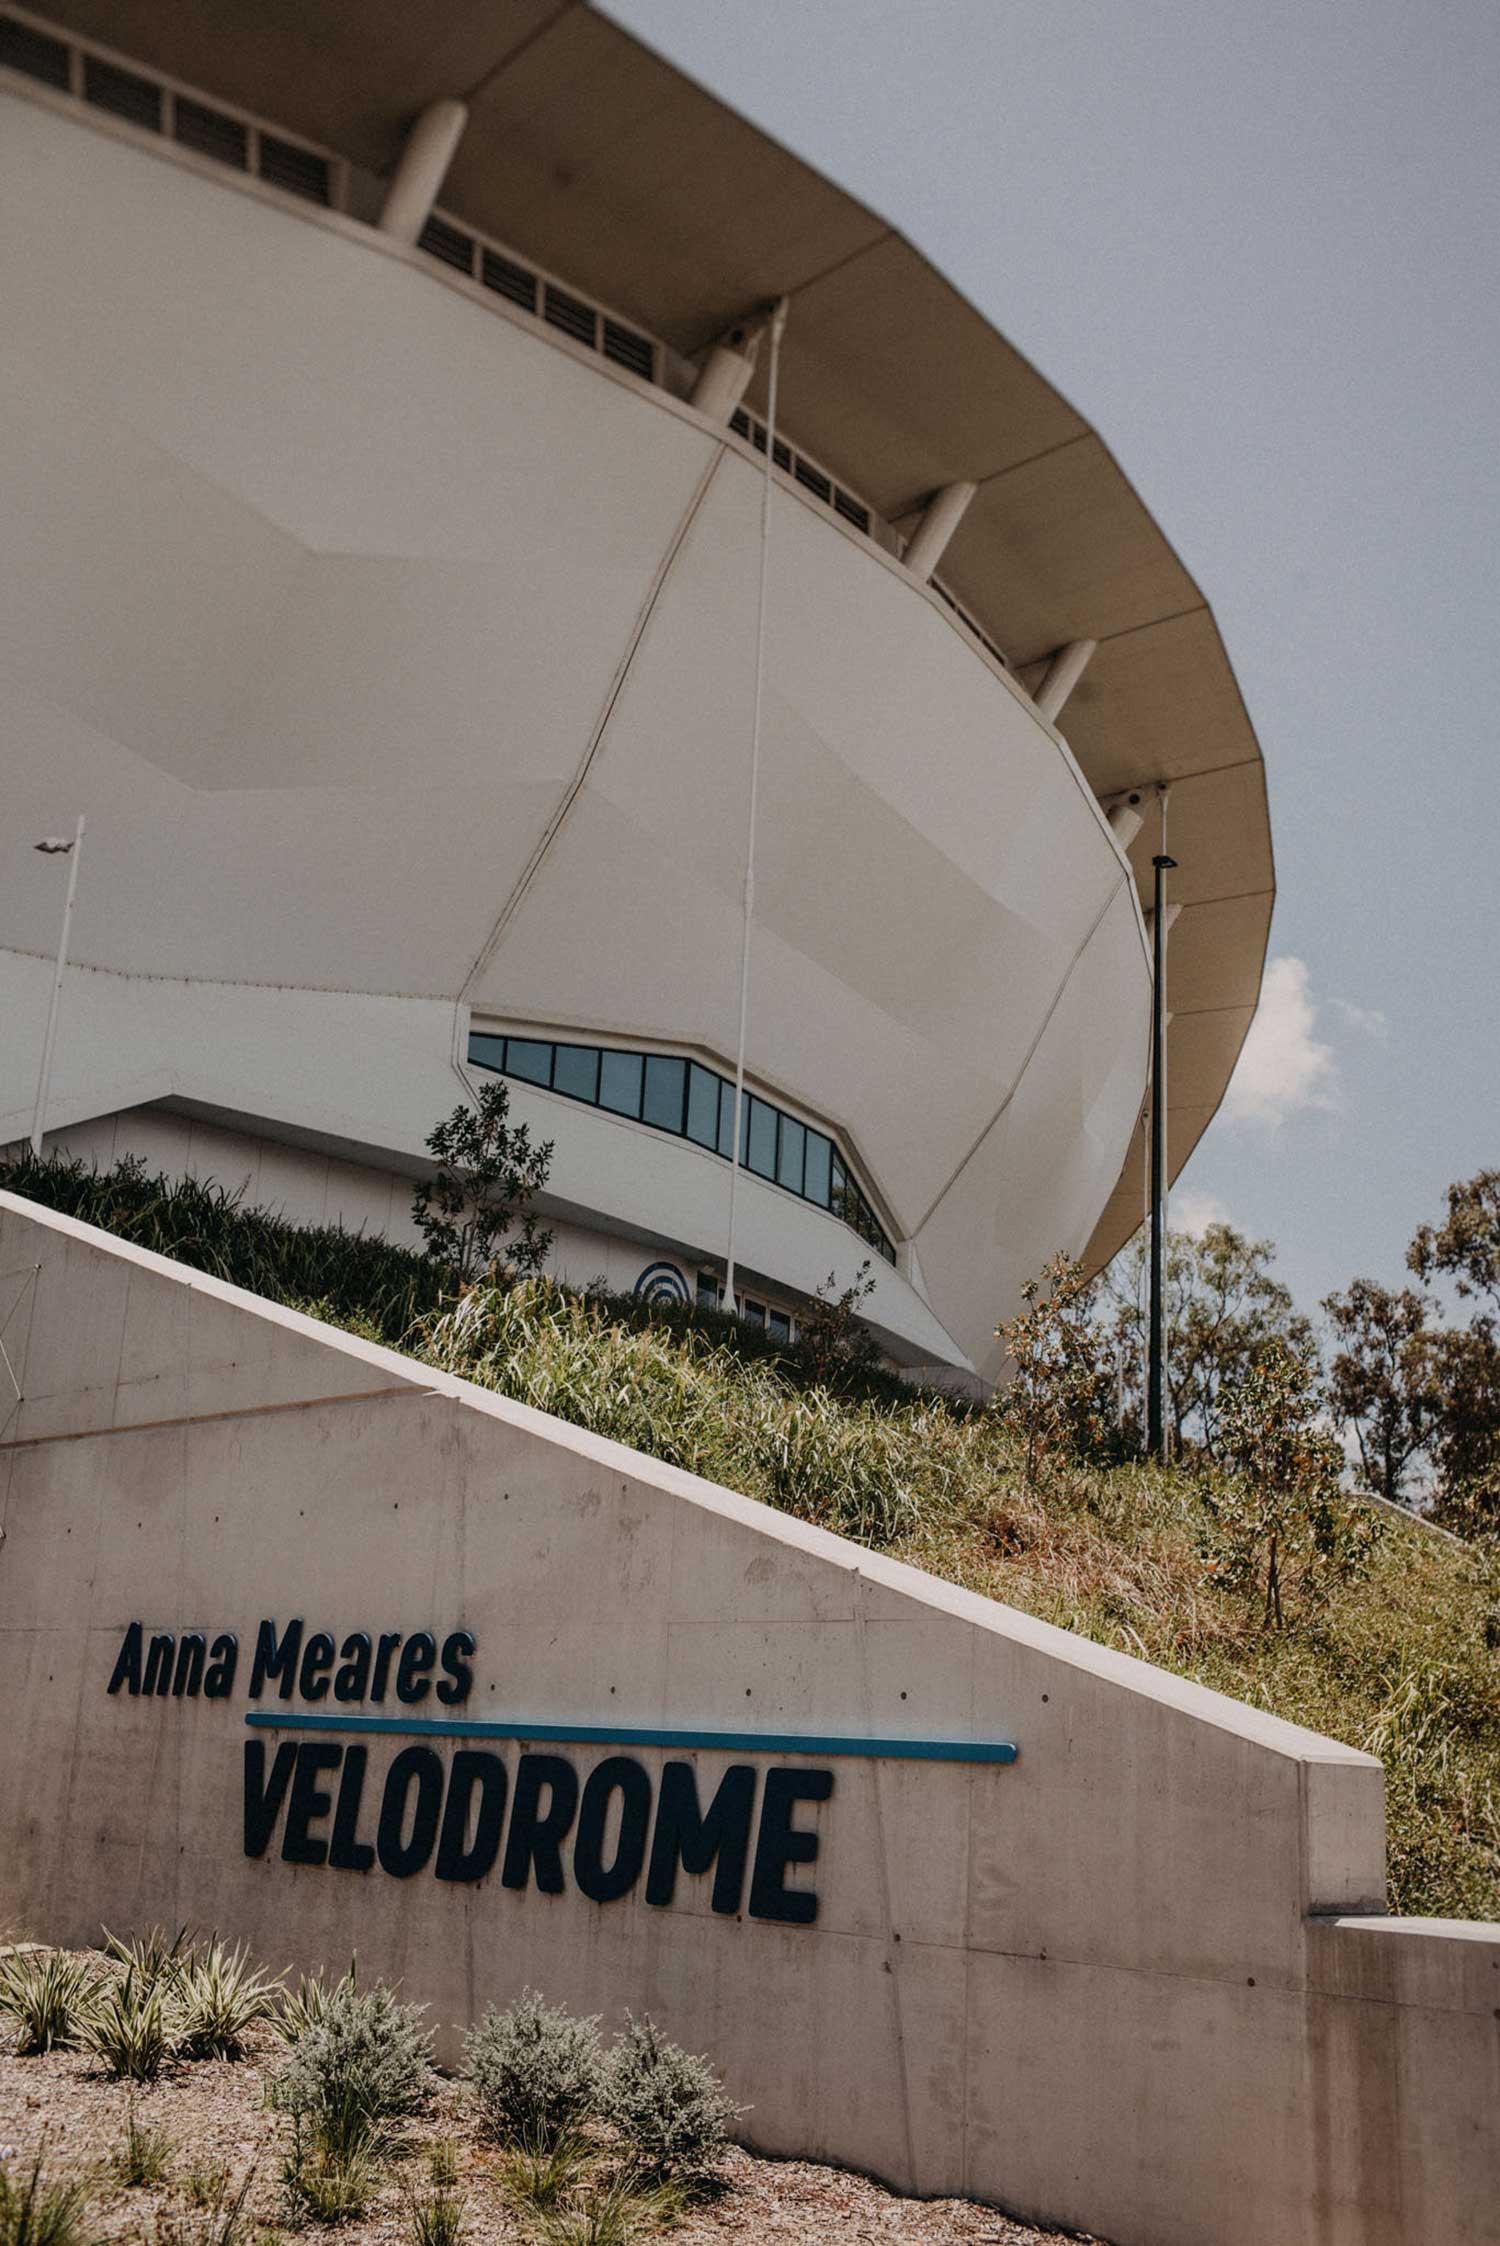 Anna Meares Velodrome in Brisbane, Australia